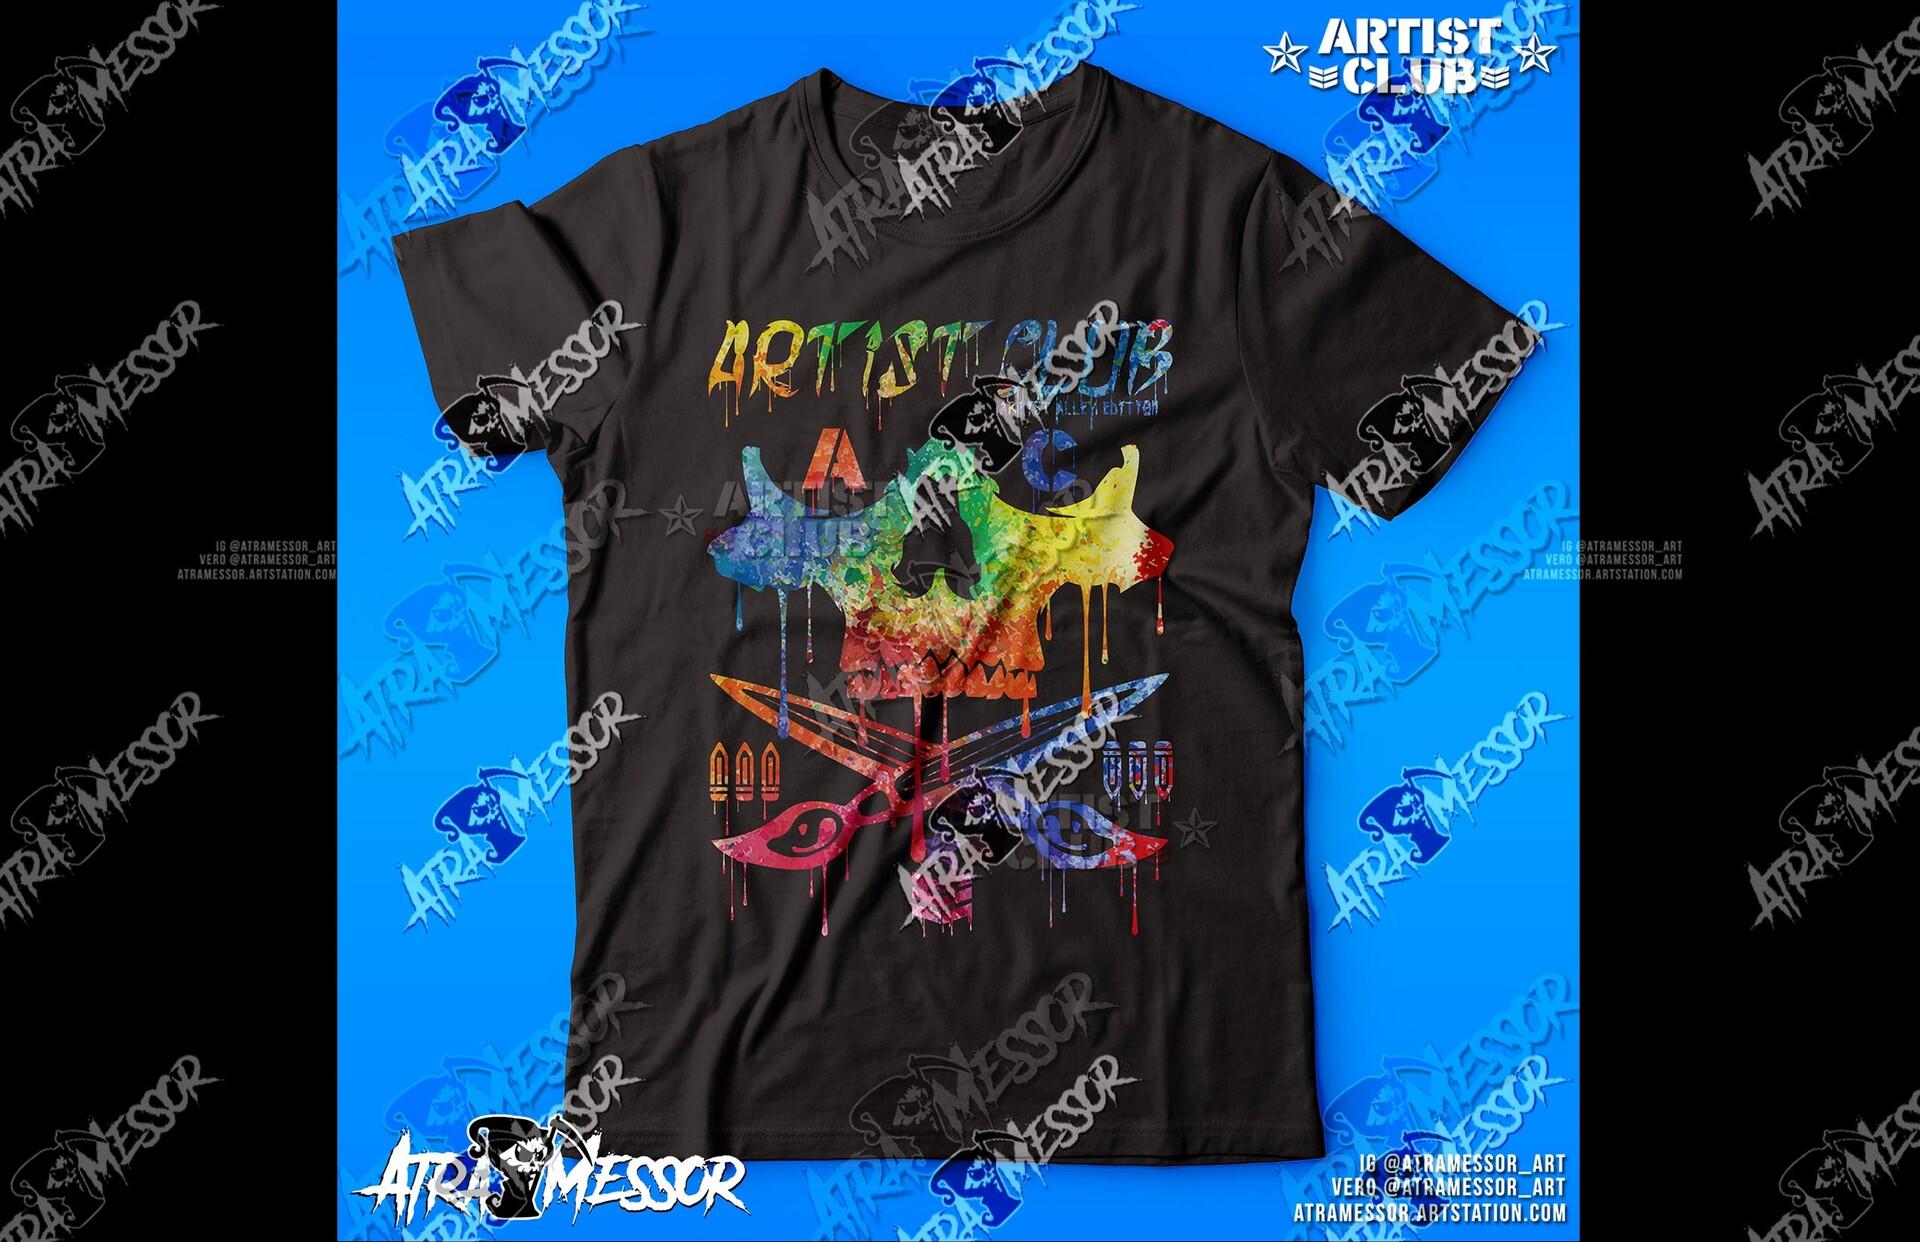 "Artist Club ""Bleed Art"" (Artist Alley Edition)"